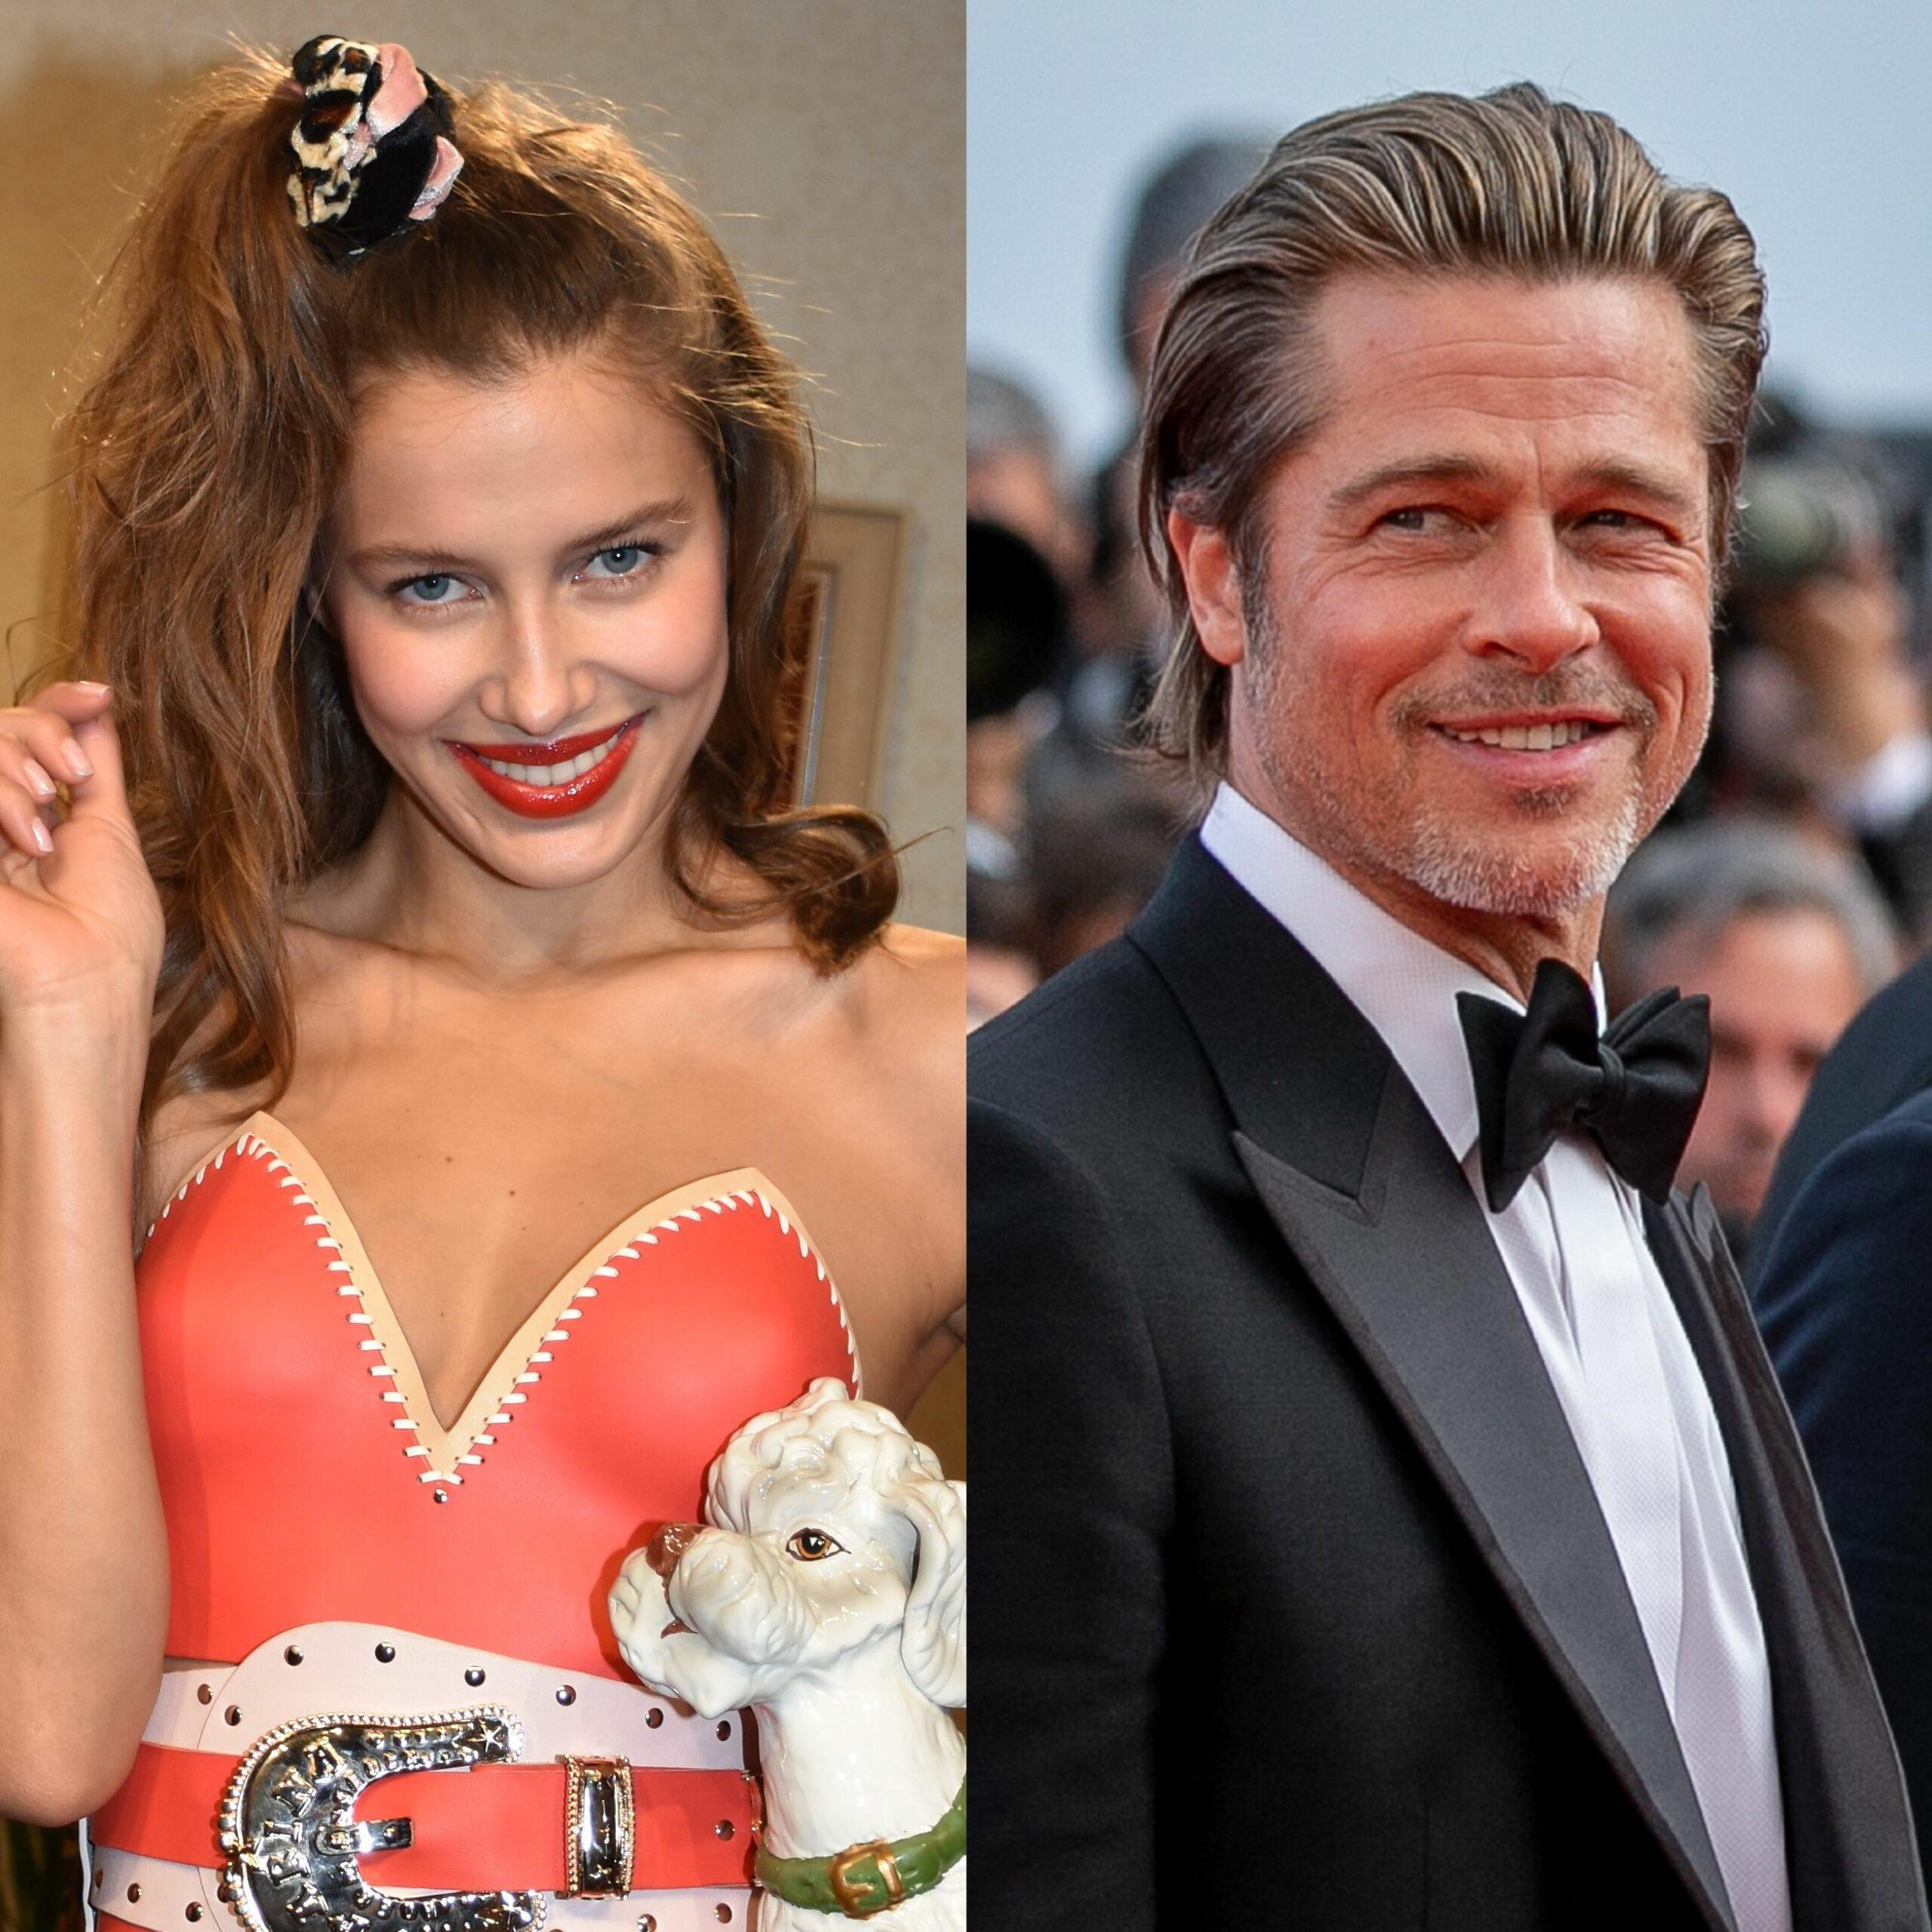 Brad Pitt Girlfriend Nicole Poturalski Age, Wiki, Instagram, Photos - Brad Pitt Girlfriend Nicole Poturalski scaled